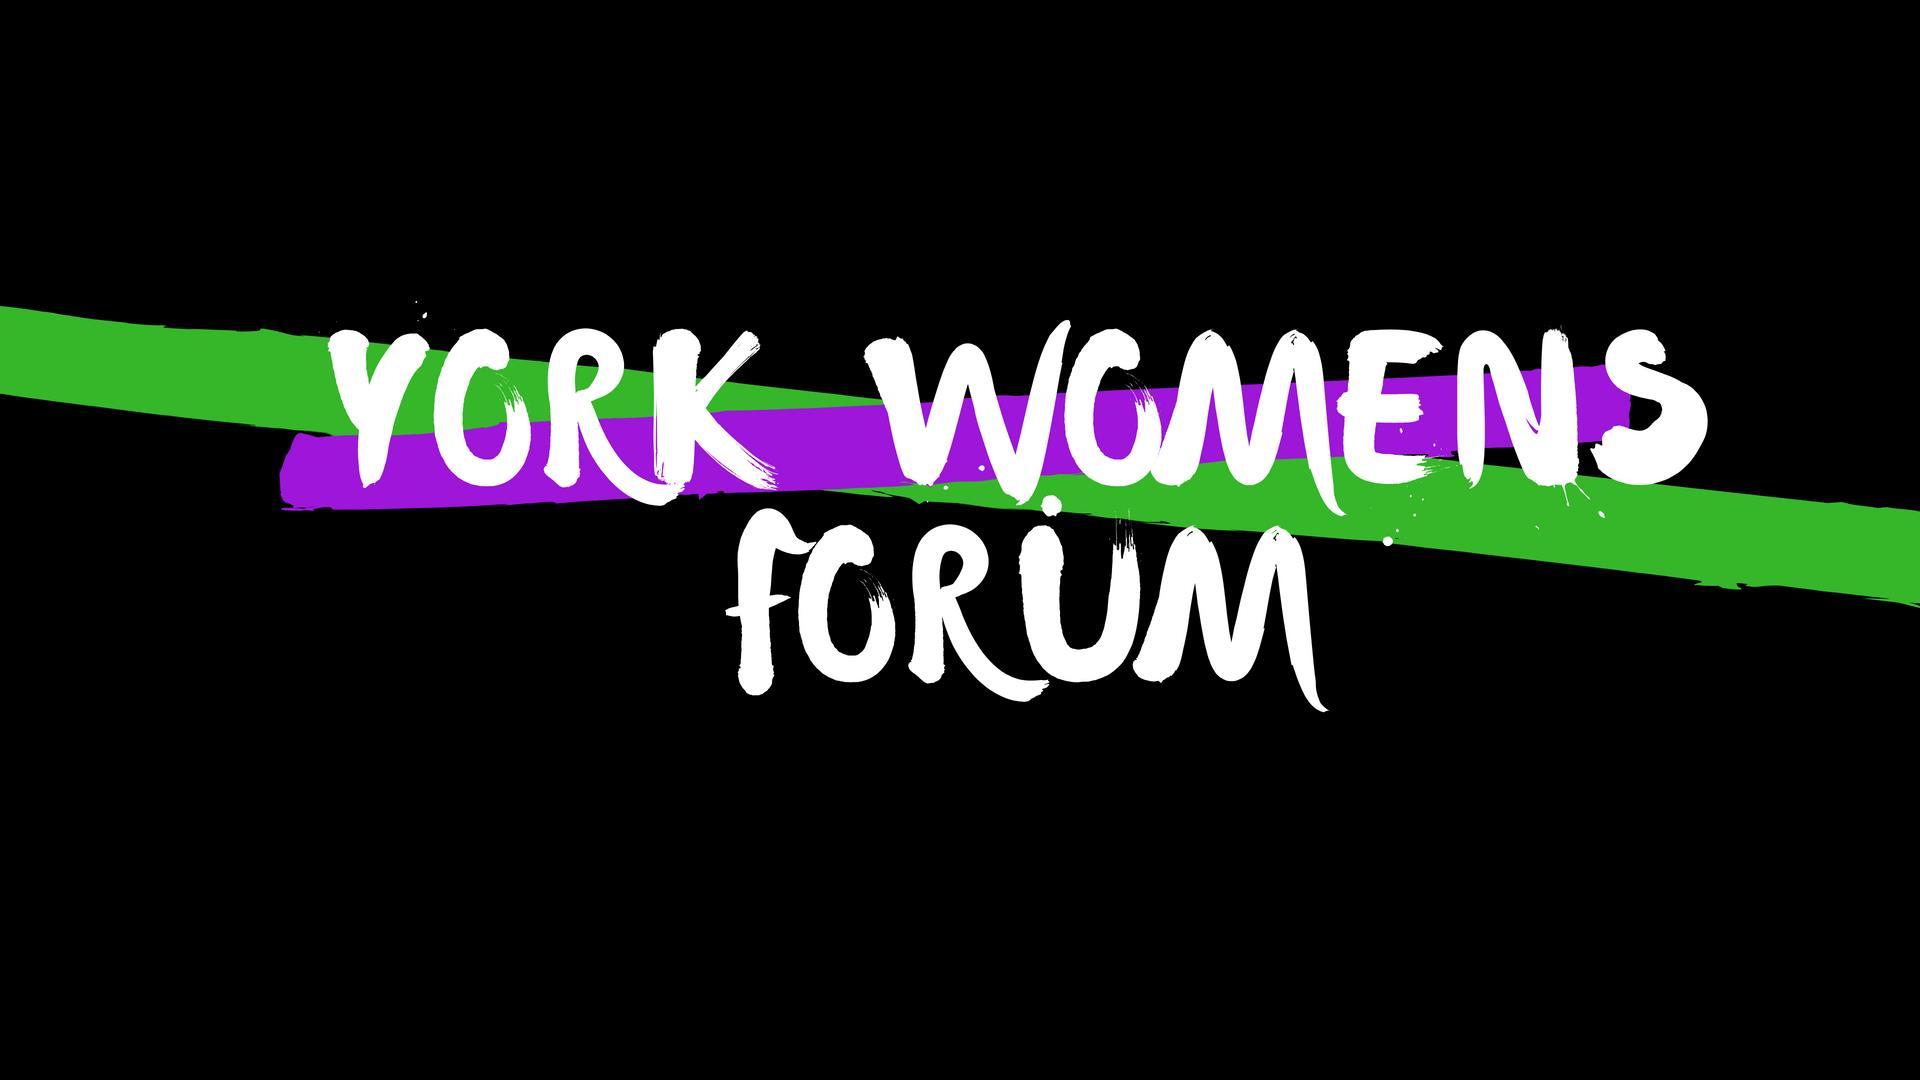 York Womens Forum.jpg